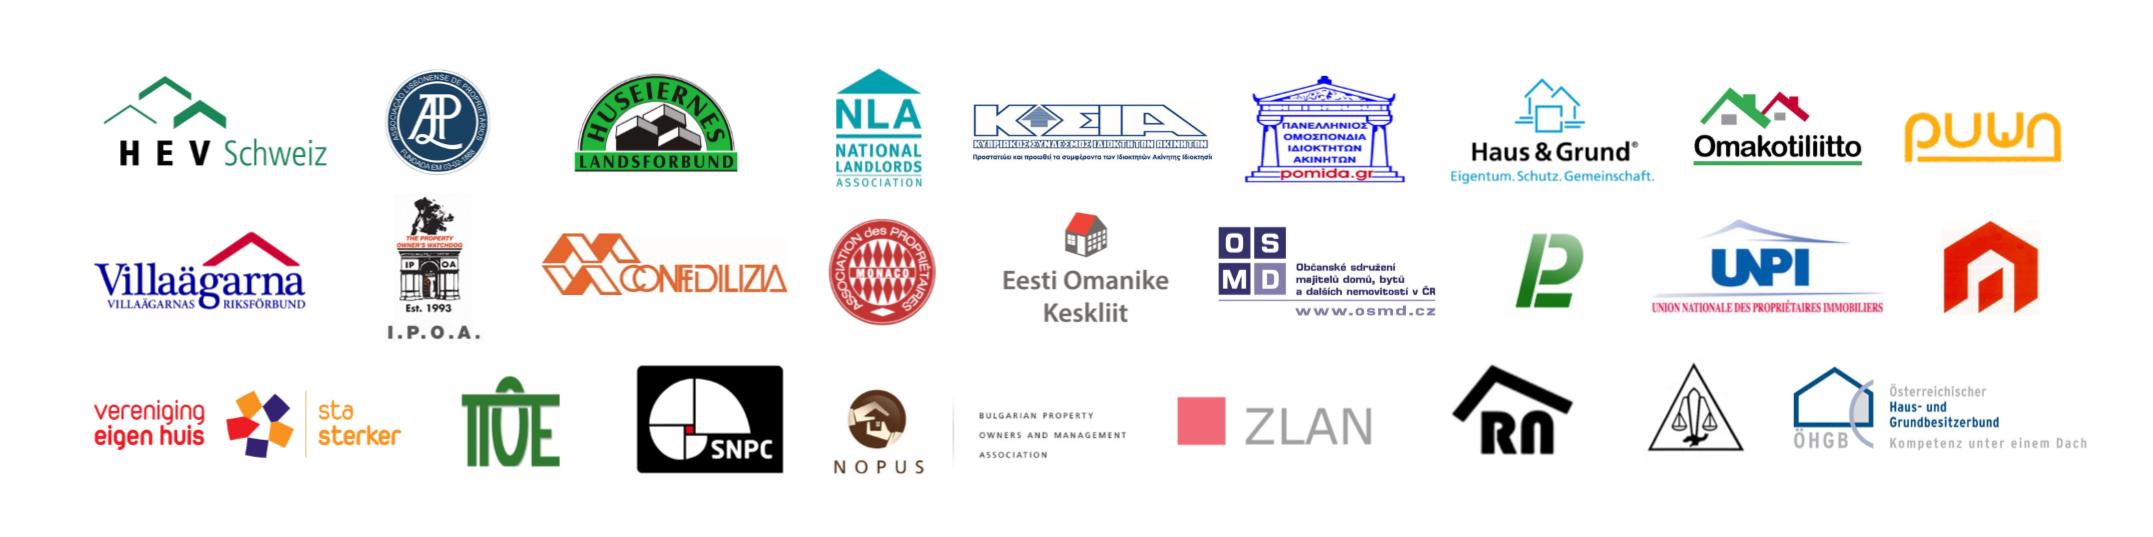 member-logos-updated-oct-2017-3-lines